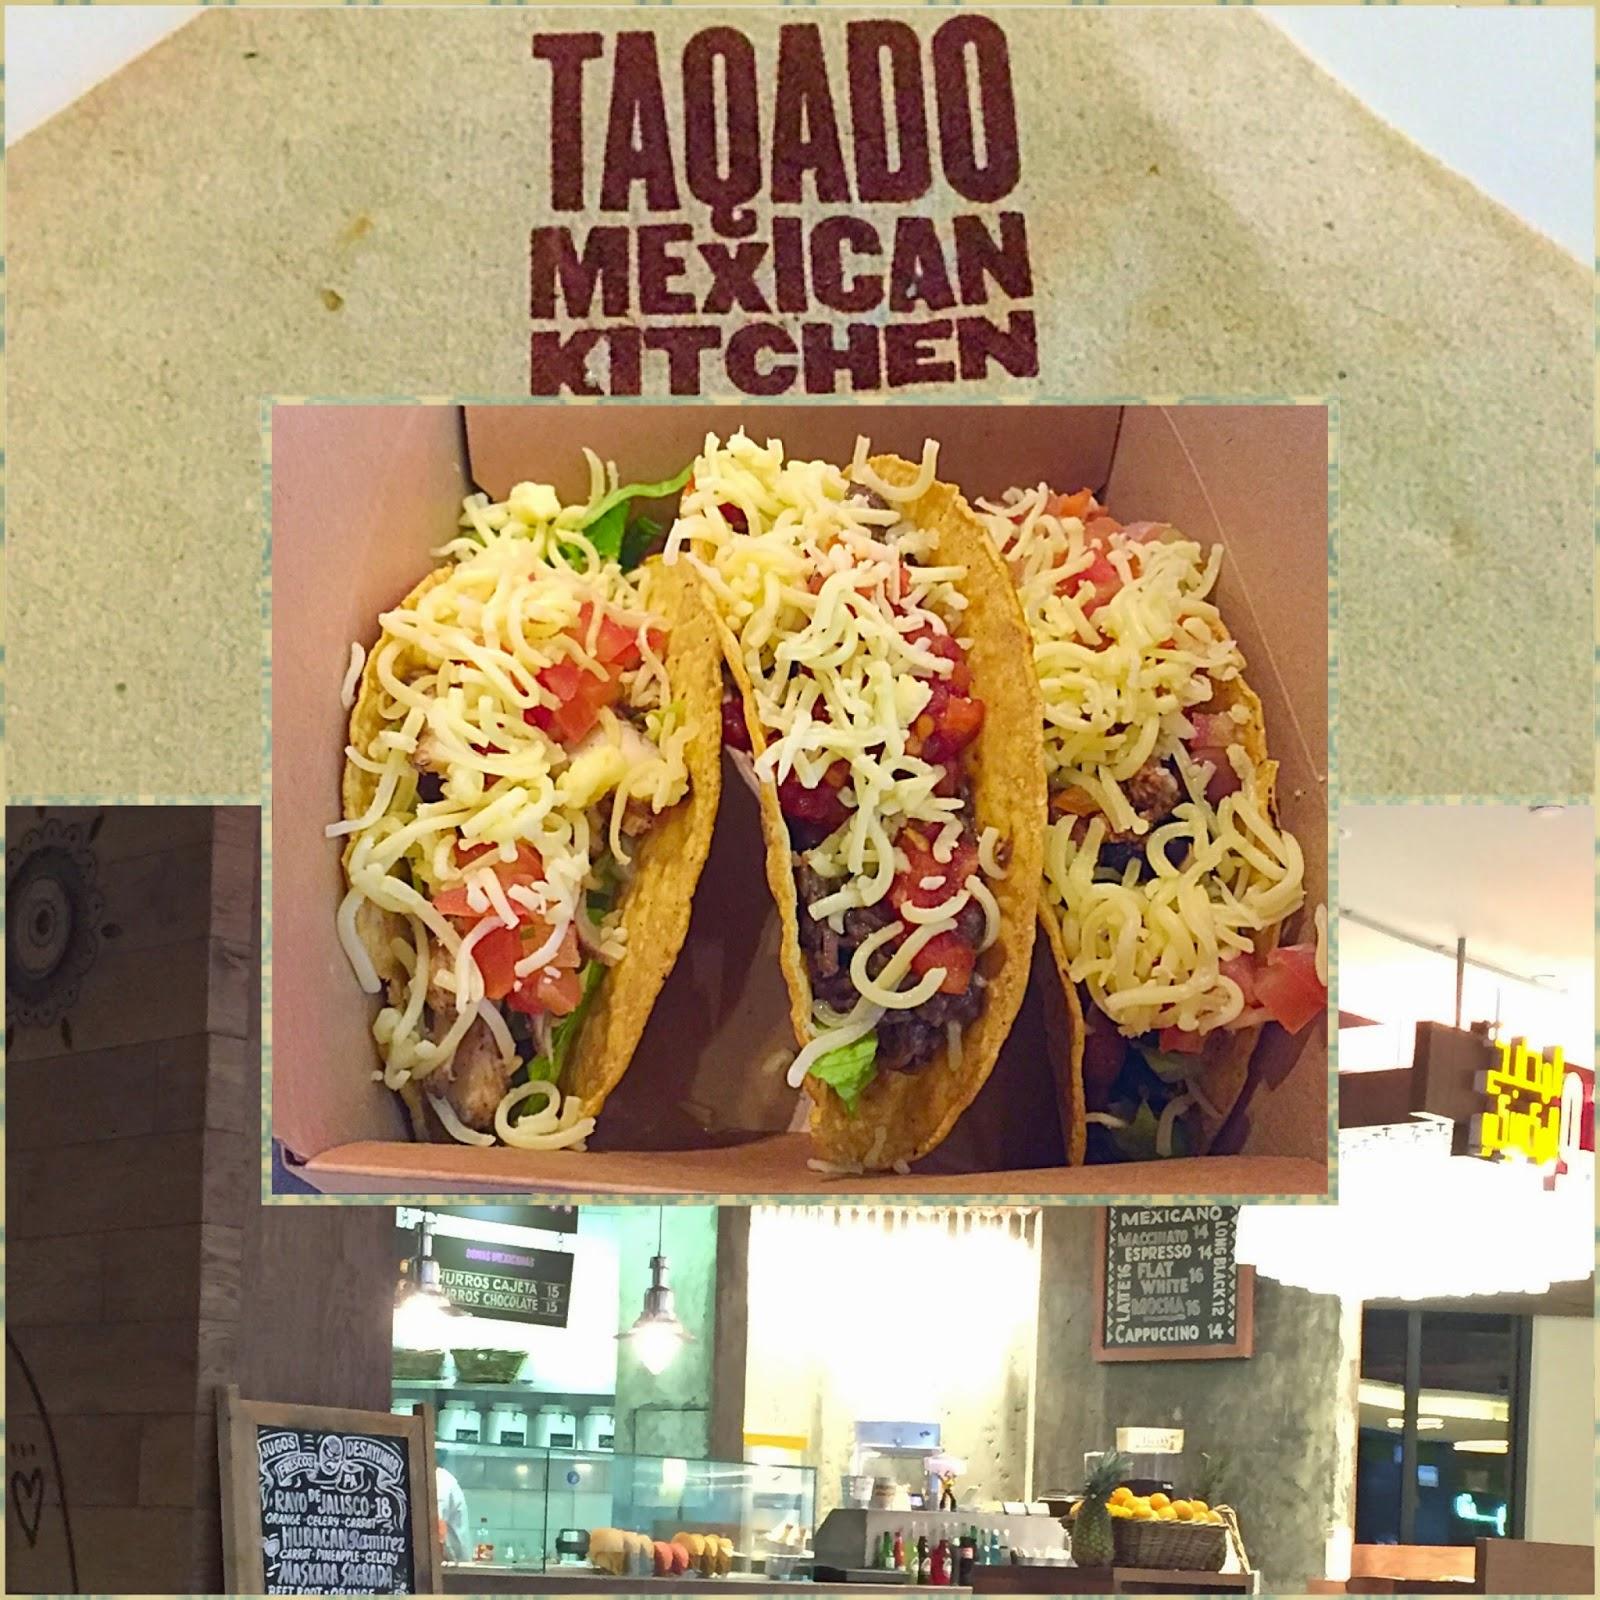 Mexican Kitchen Vambinas Eats Travels Dreams Food Trip Taqado Mexican Kitchen